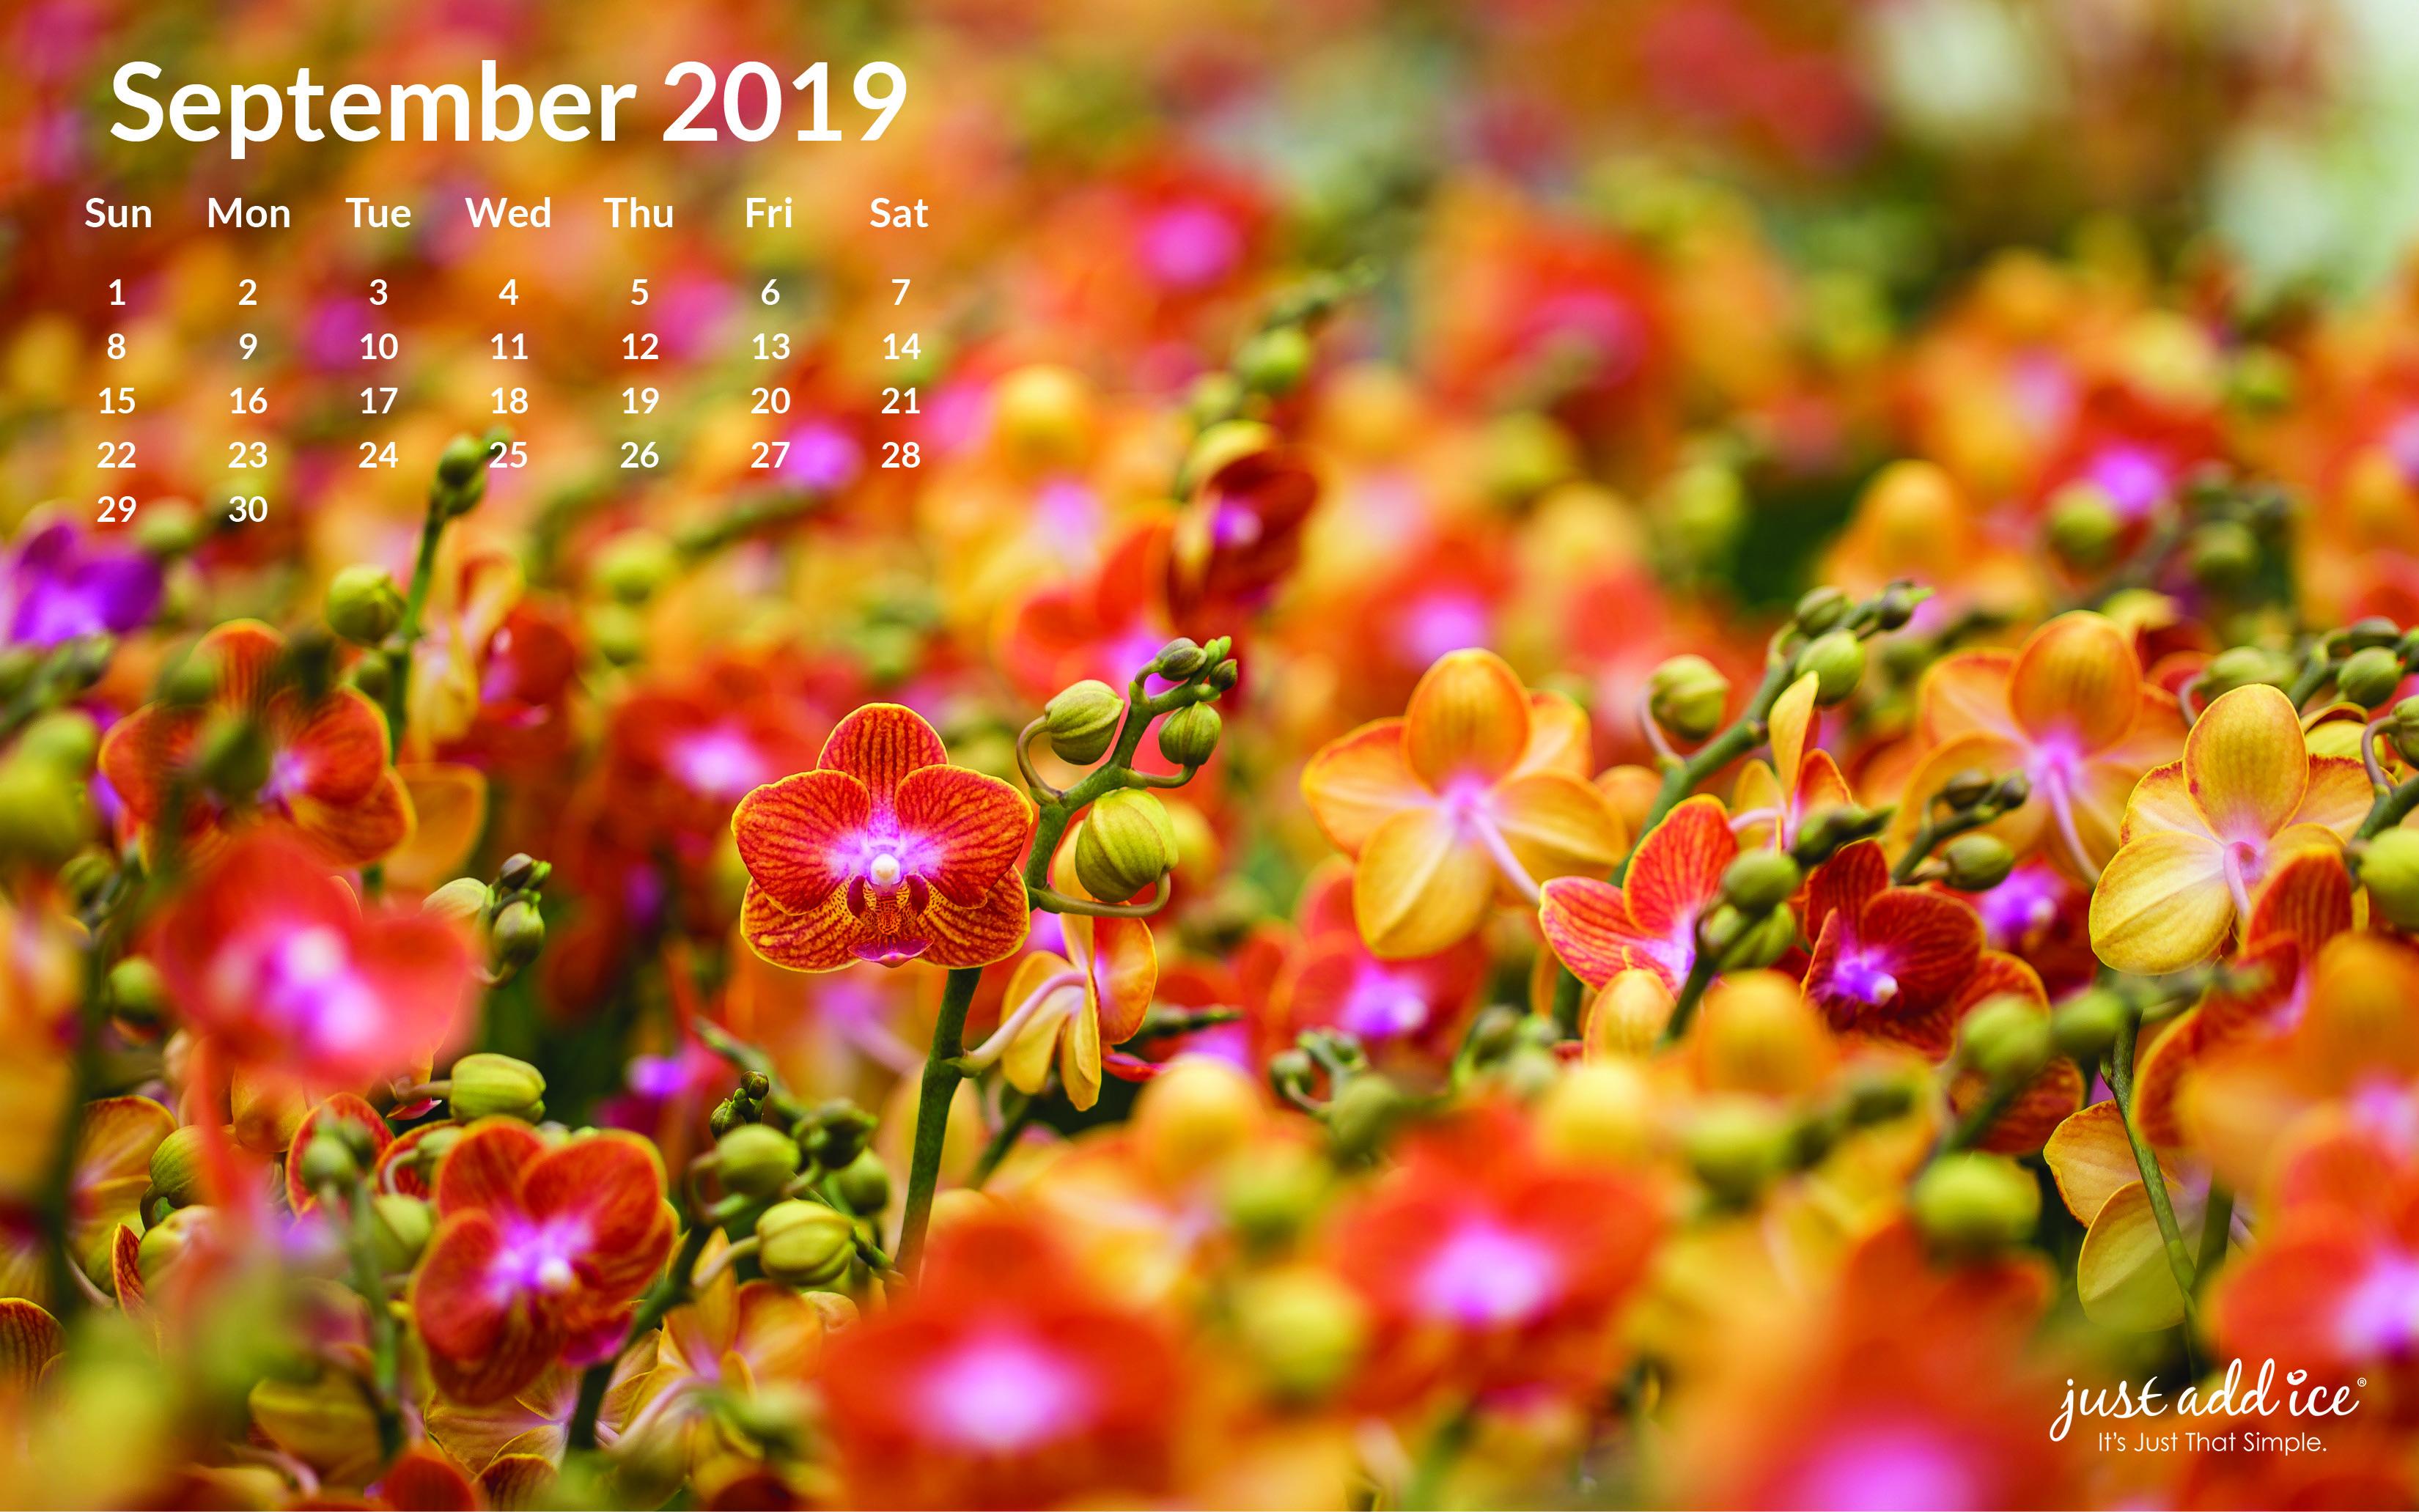 September 2019 Watering Calendar